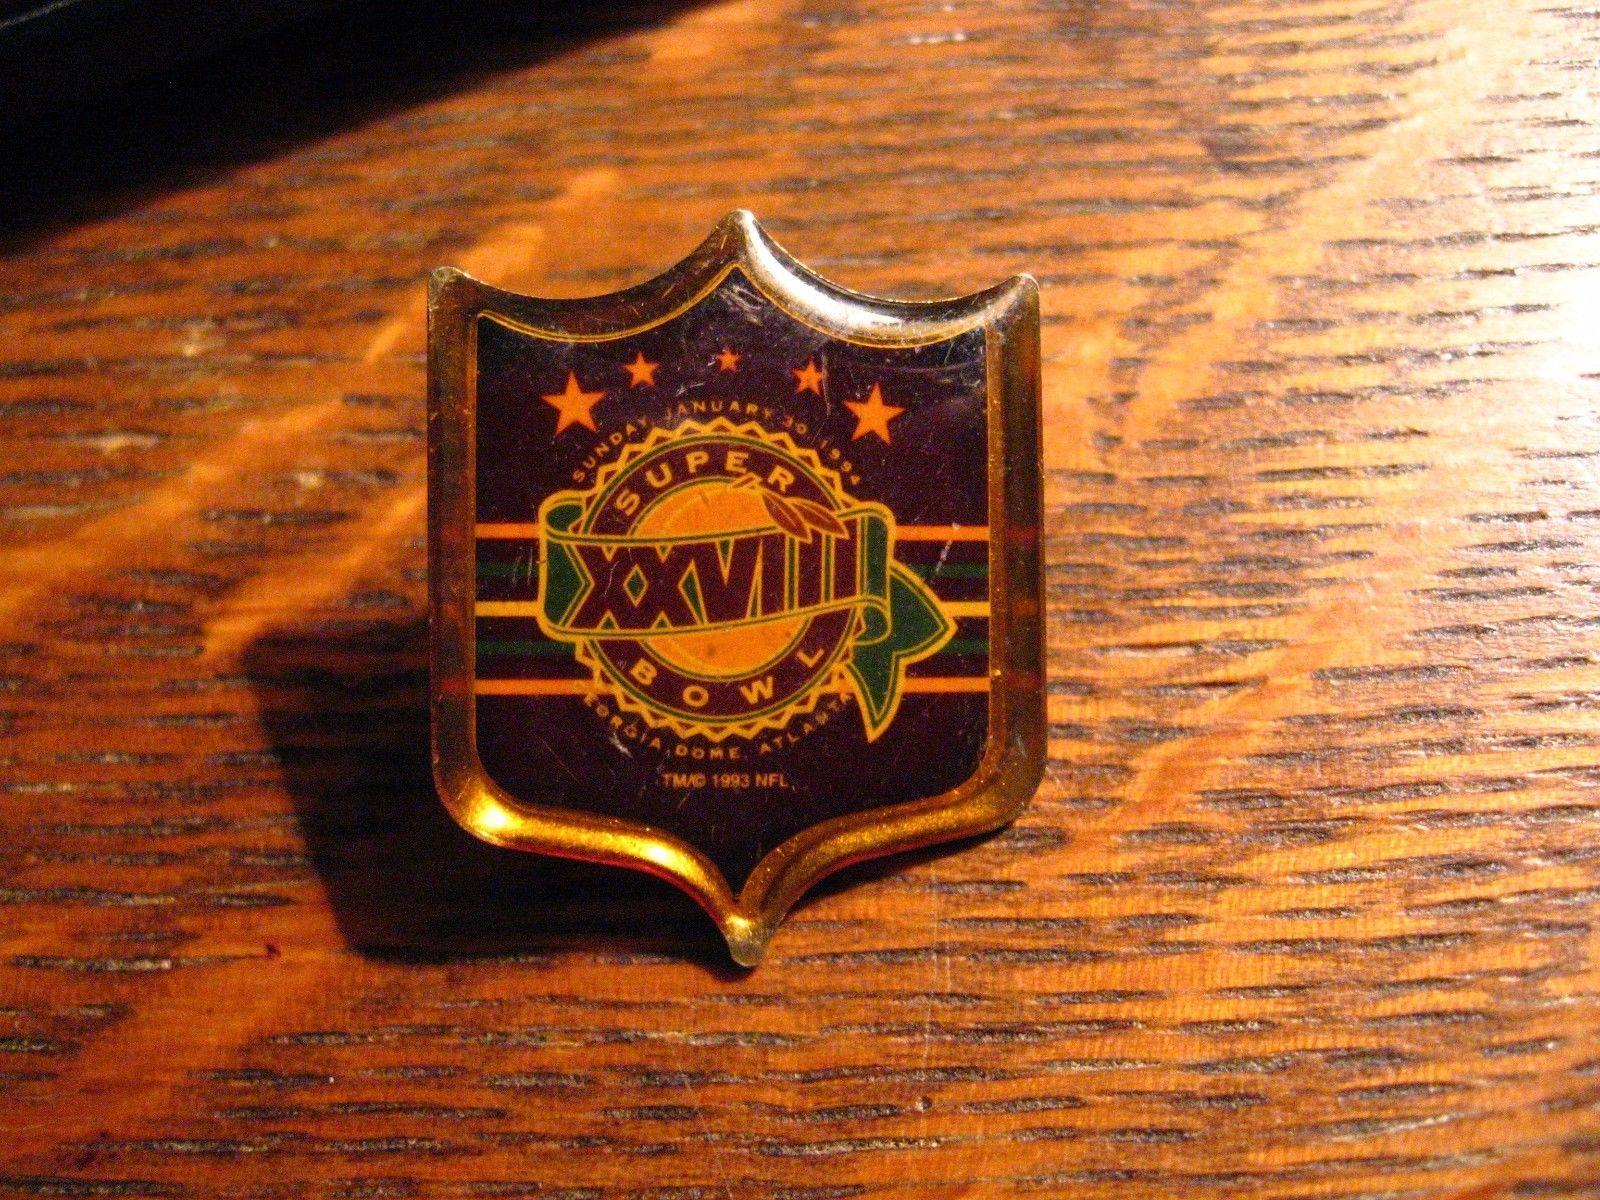 Super Bowl XXVIII Pin - Vintage 1994 Georgia Dome Atlanta Dallas Cowboys NFL Pin